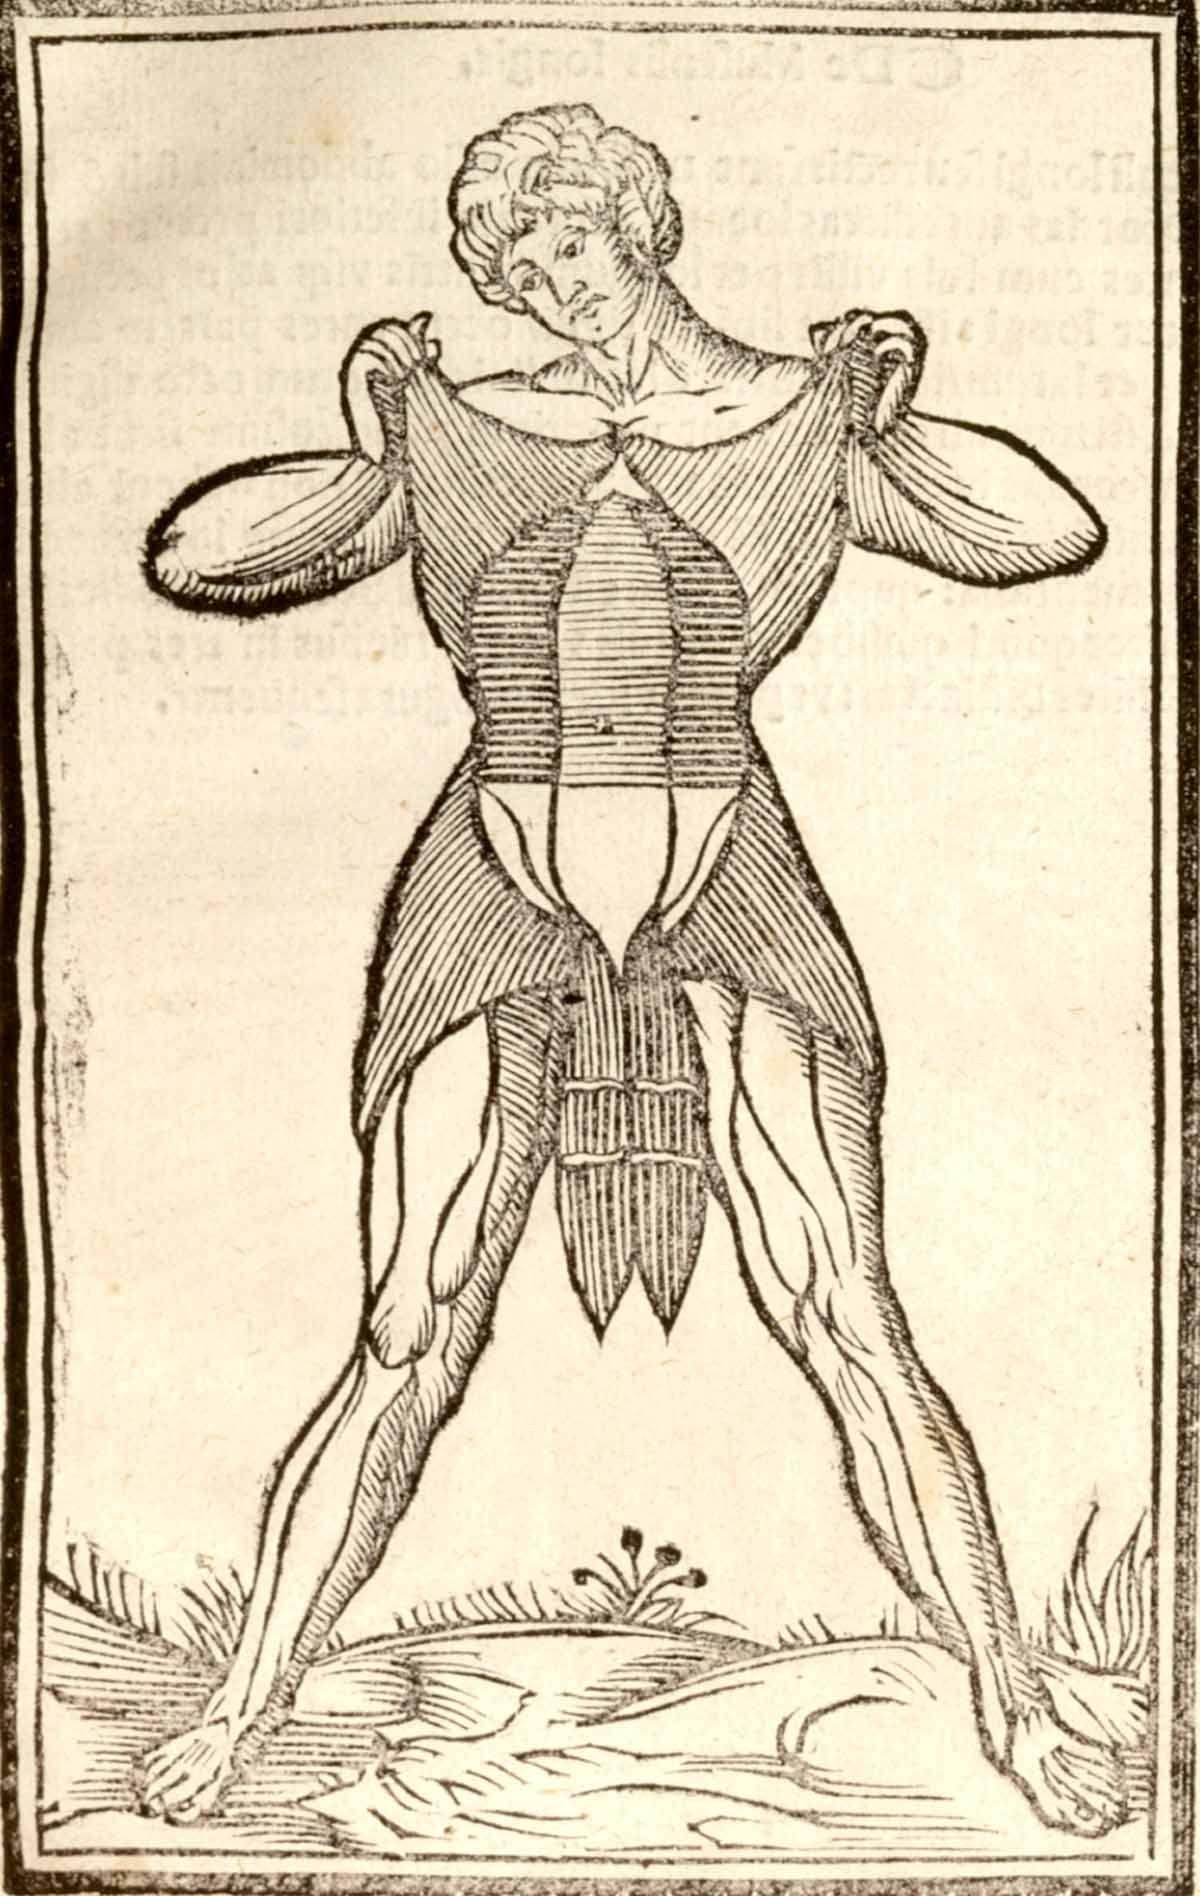 Right page of Anatomia Carpi by Jacopo Berengario da Carpi, 1535 ...